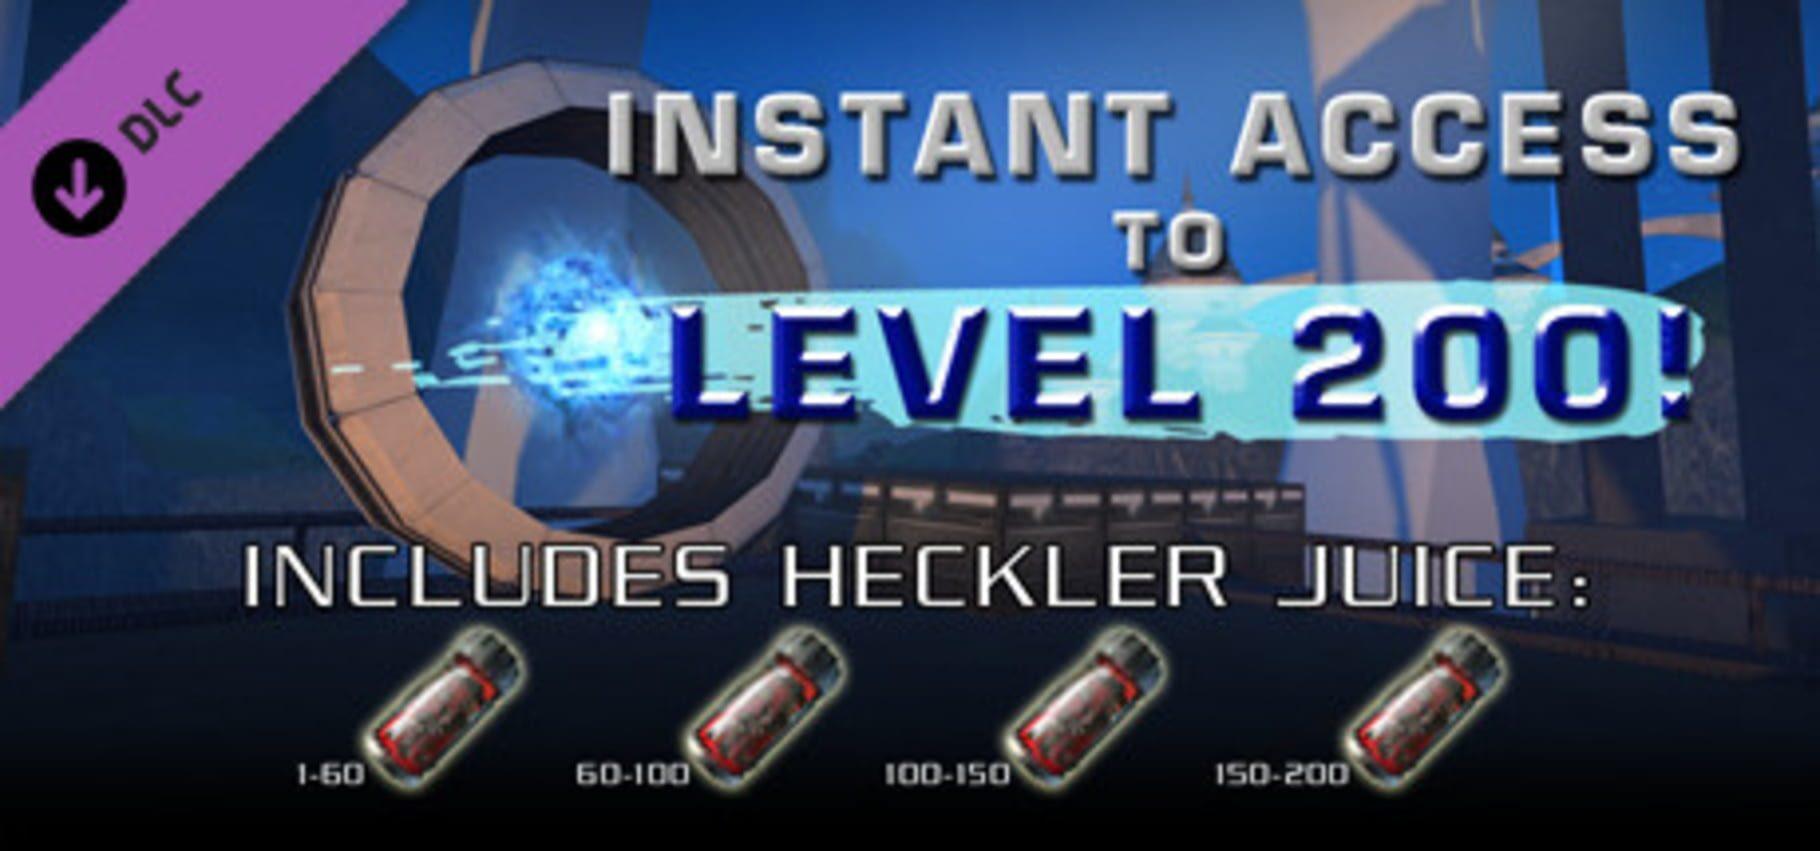 buy Anarchy Online: Access Level 200 Heckler Juices cd key for pc platform